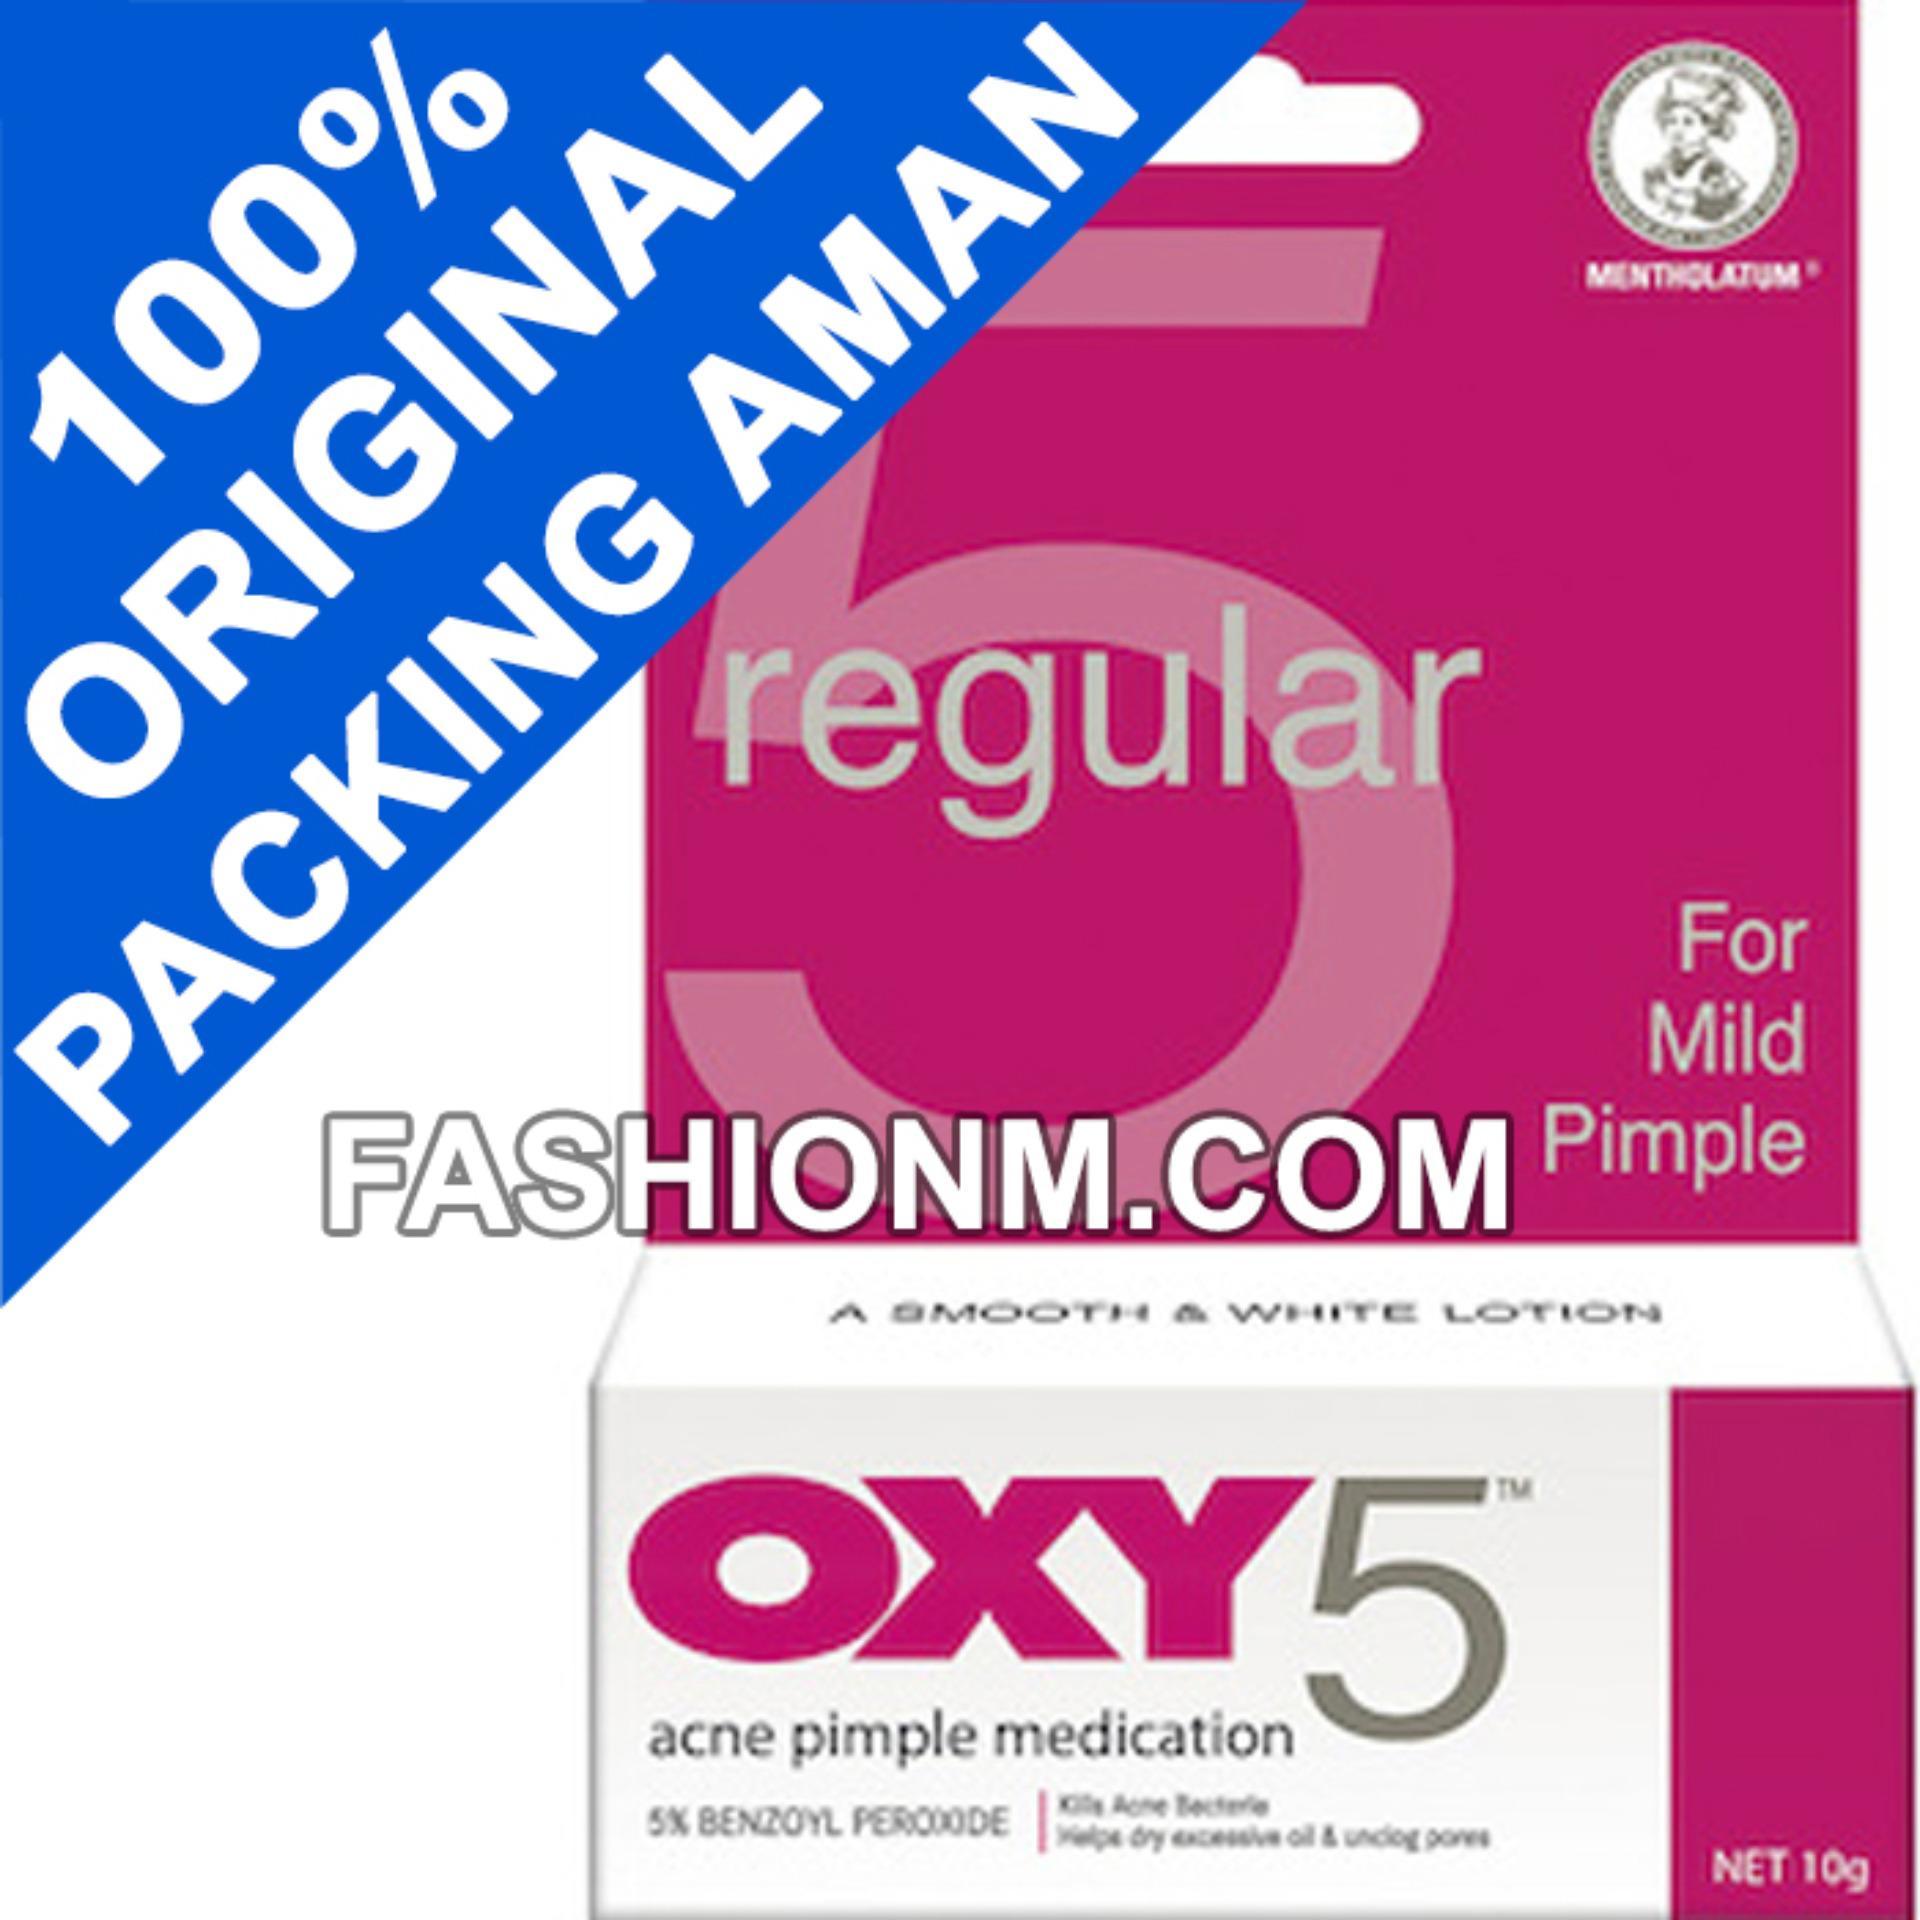 OXY 5 Acne Pimple 10g For Mild Pimple - Obat Jerawat